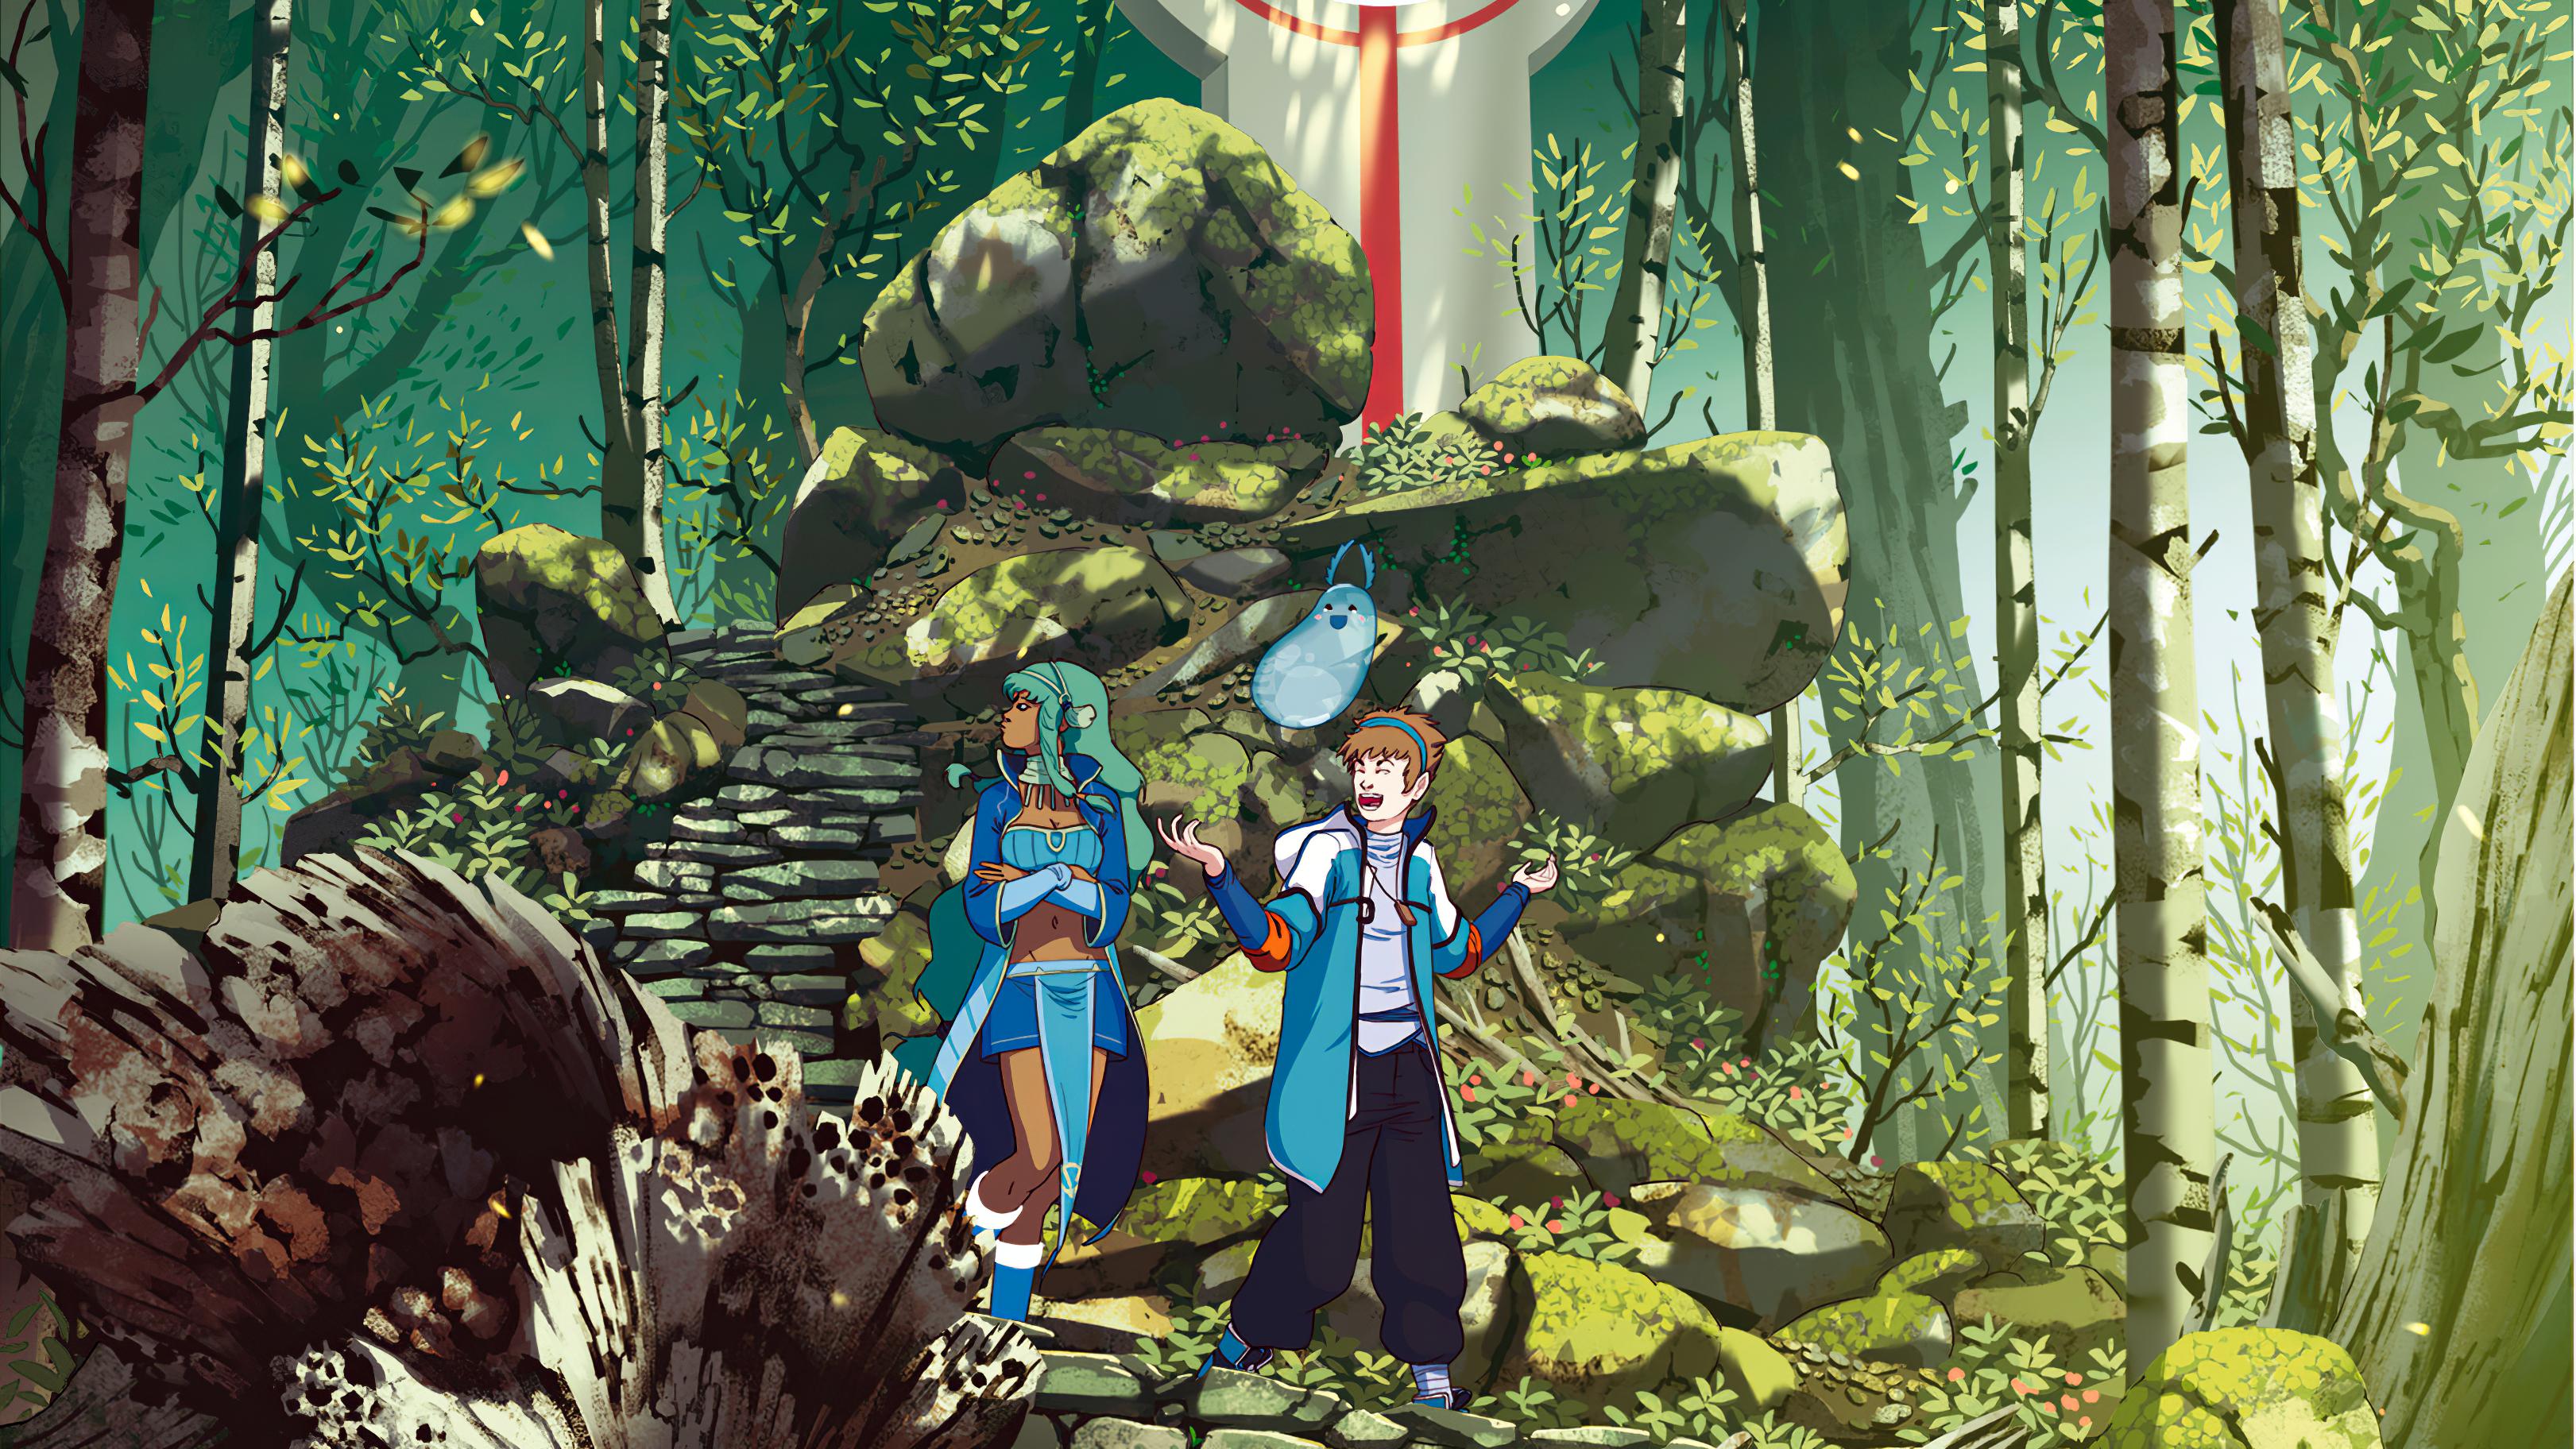 Anime 3242x1824 Lorenzo Lanfranconi artwork digital art Chiara Zuliani forest stairs